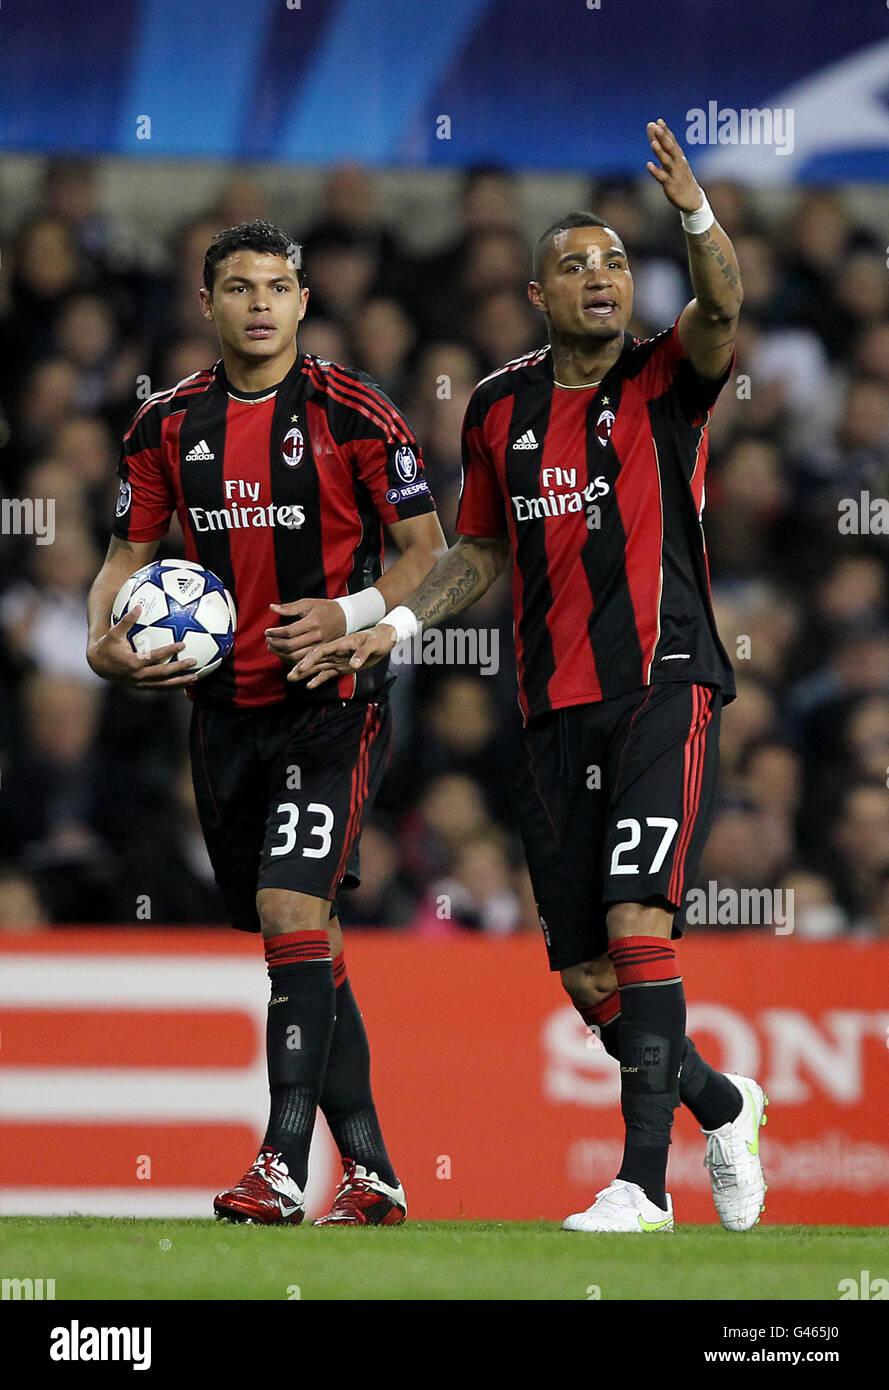 Soccer - UEFA Champions League - Round of 16 - Second Leg - Tottenham Hotspur v AC Milan - White Hart Lane - Stock Image